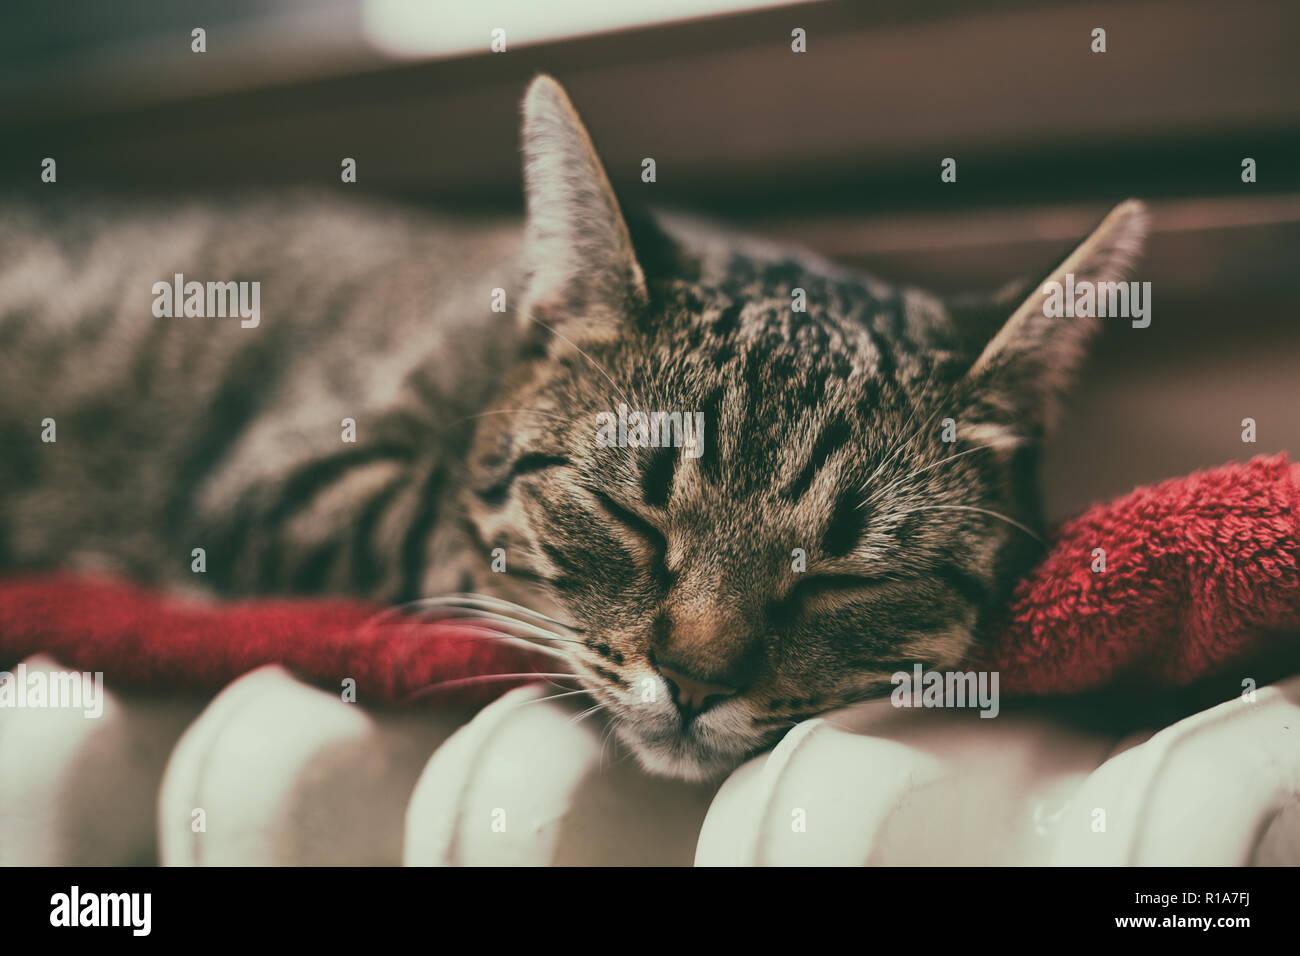 Beautiful cat sleeping on radiator by the window. - Stock Image